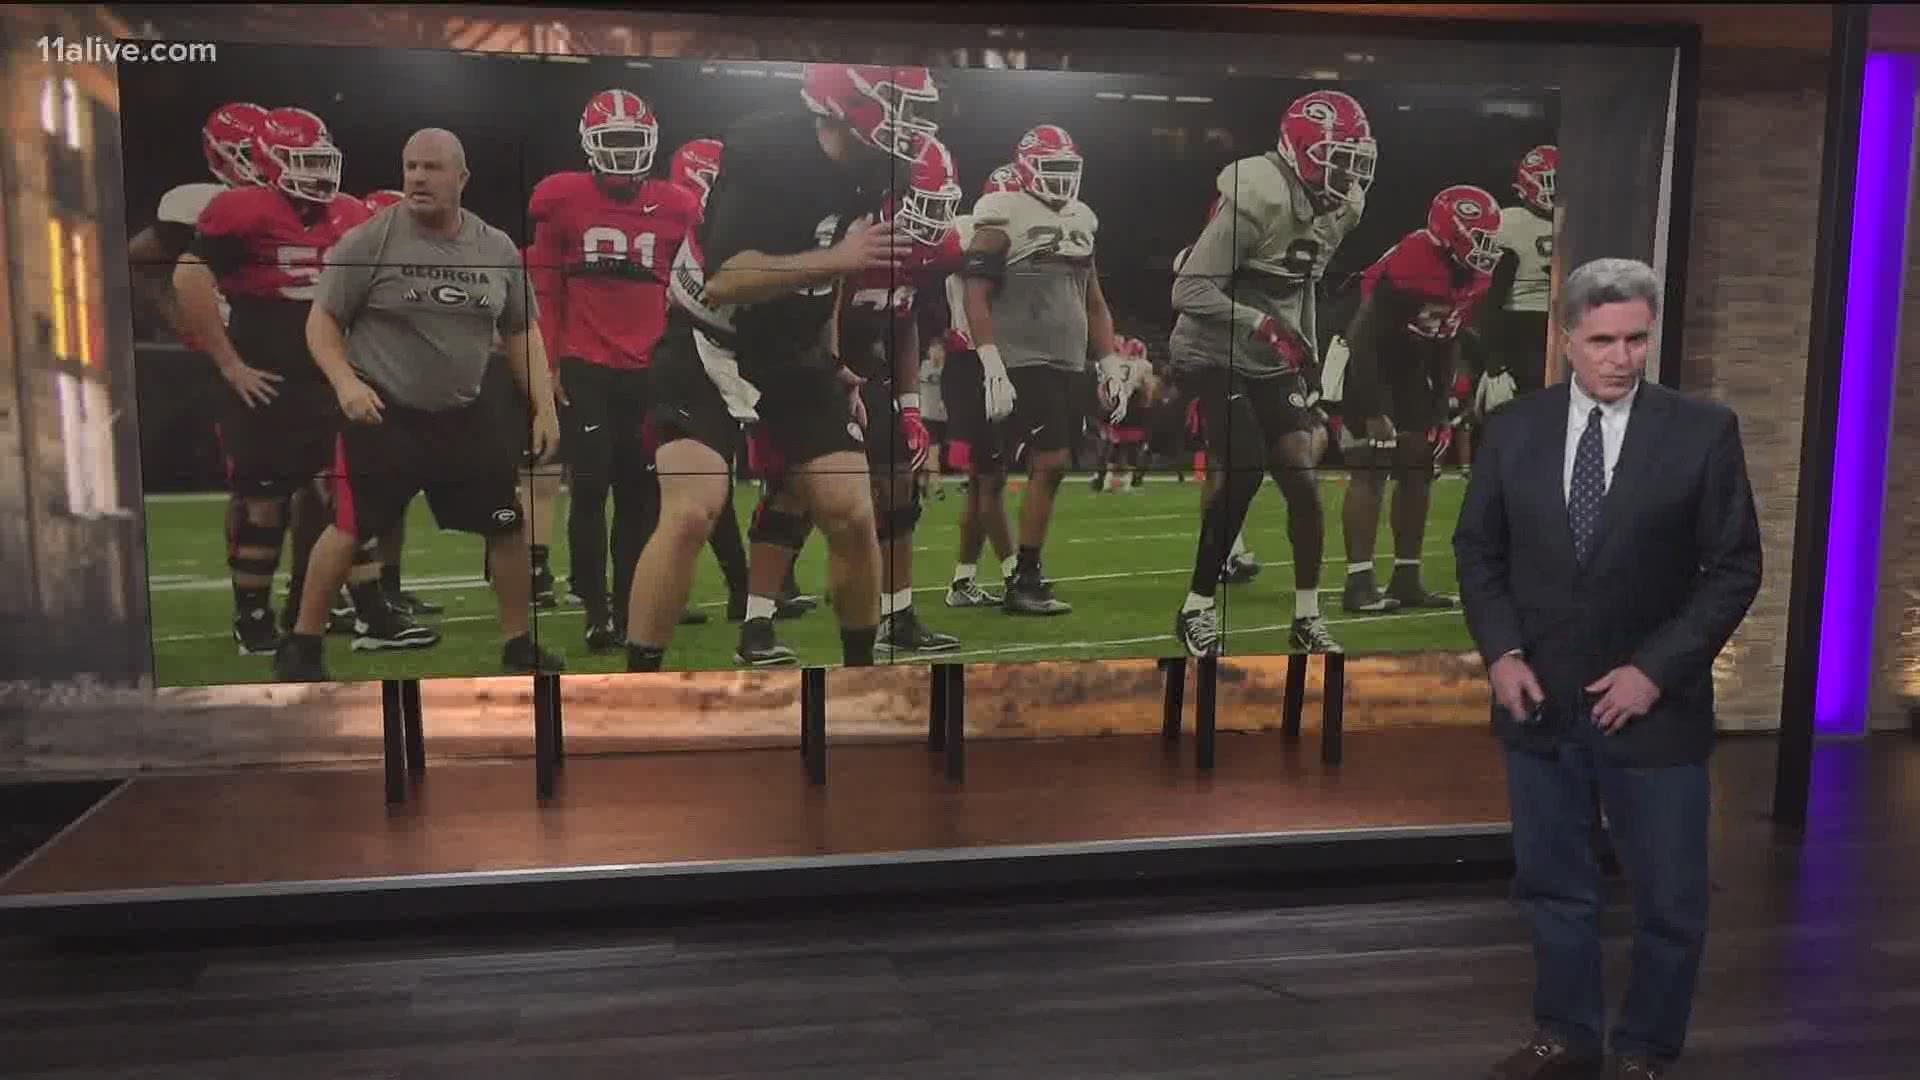 Marlin Dean Recommits To University Of Georgia 11alive Com